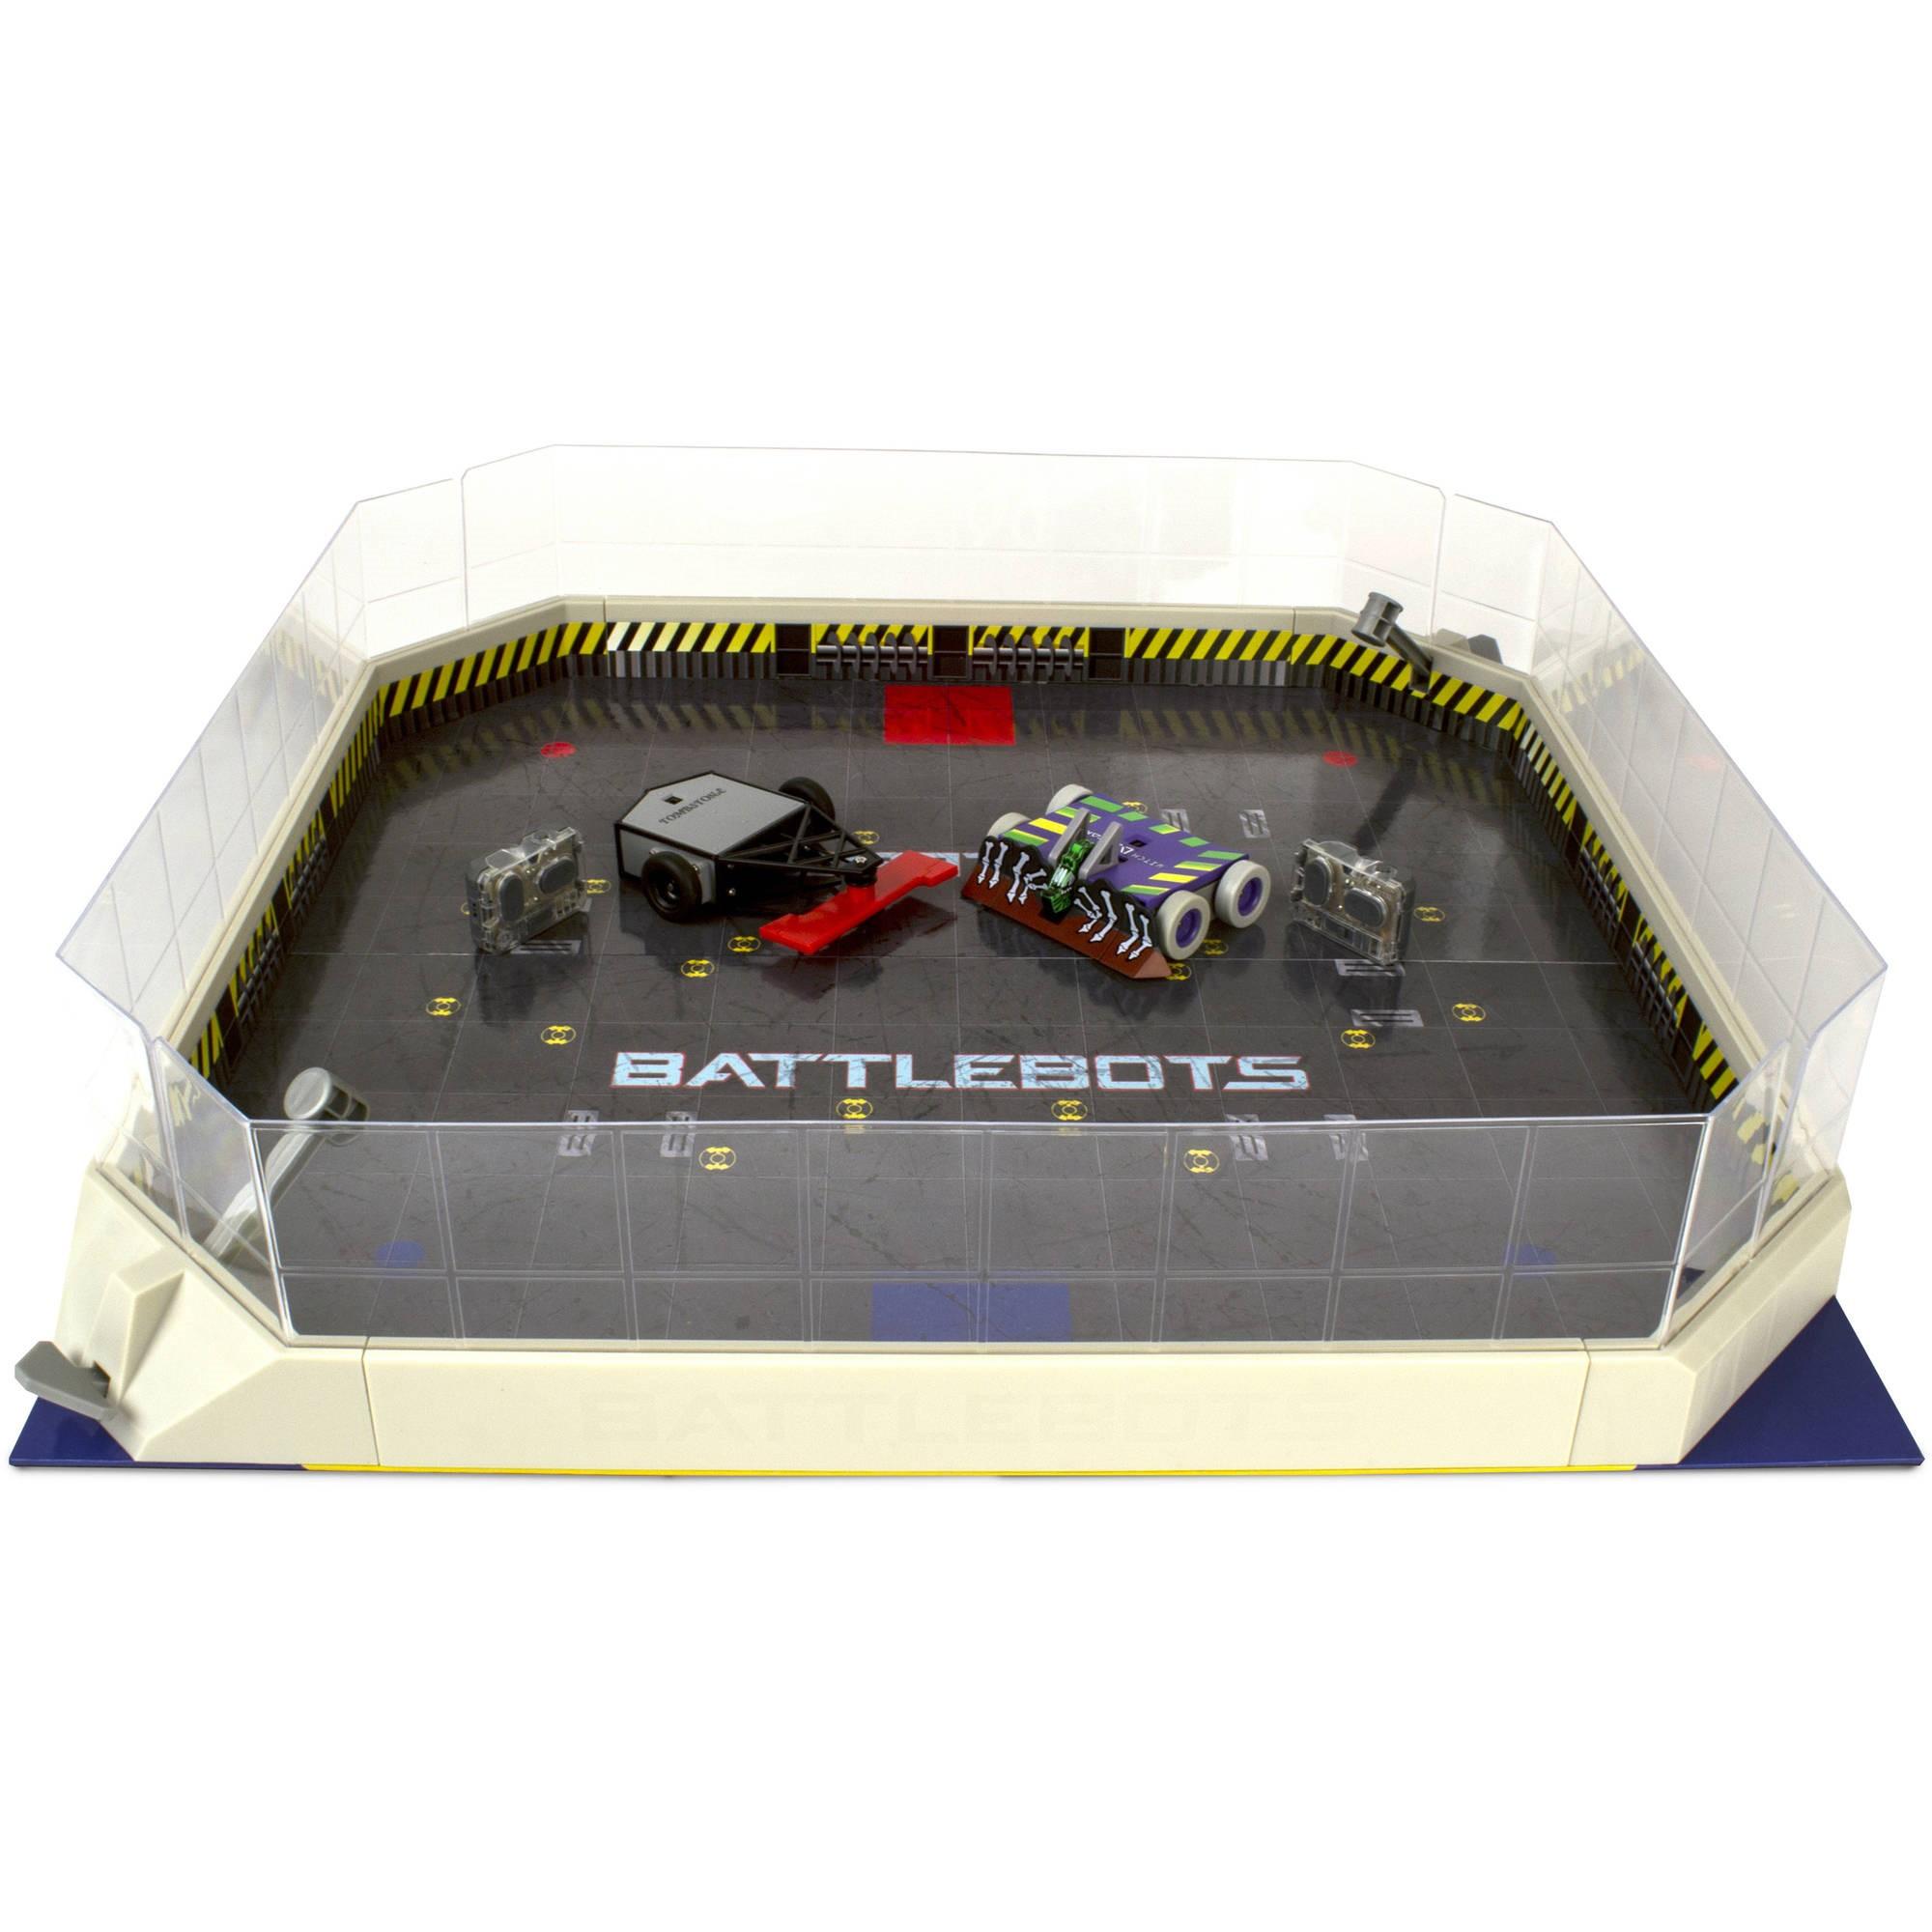 Hexbug Battlebots Arena Playset Infrared